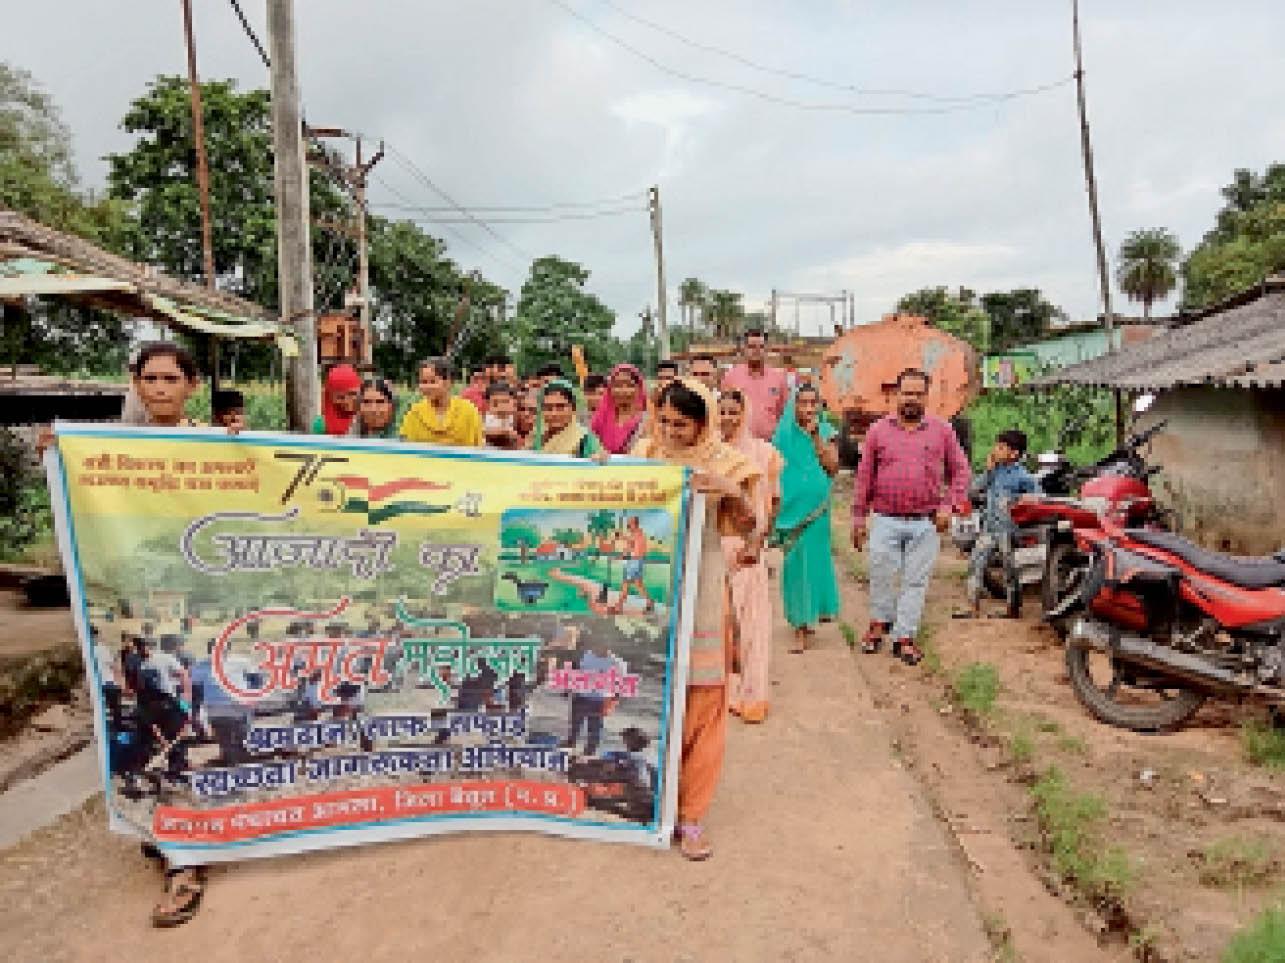 ग्रामीण महिलाएं स्वच्छता रैली निकालते हुए। - Dainik Bhaskar